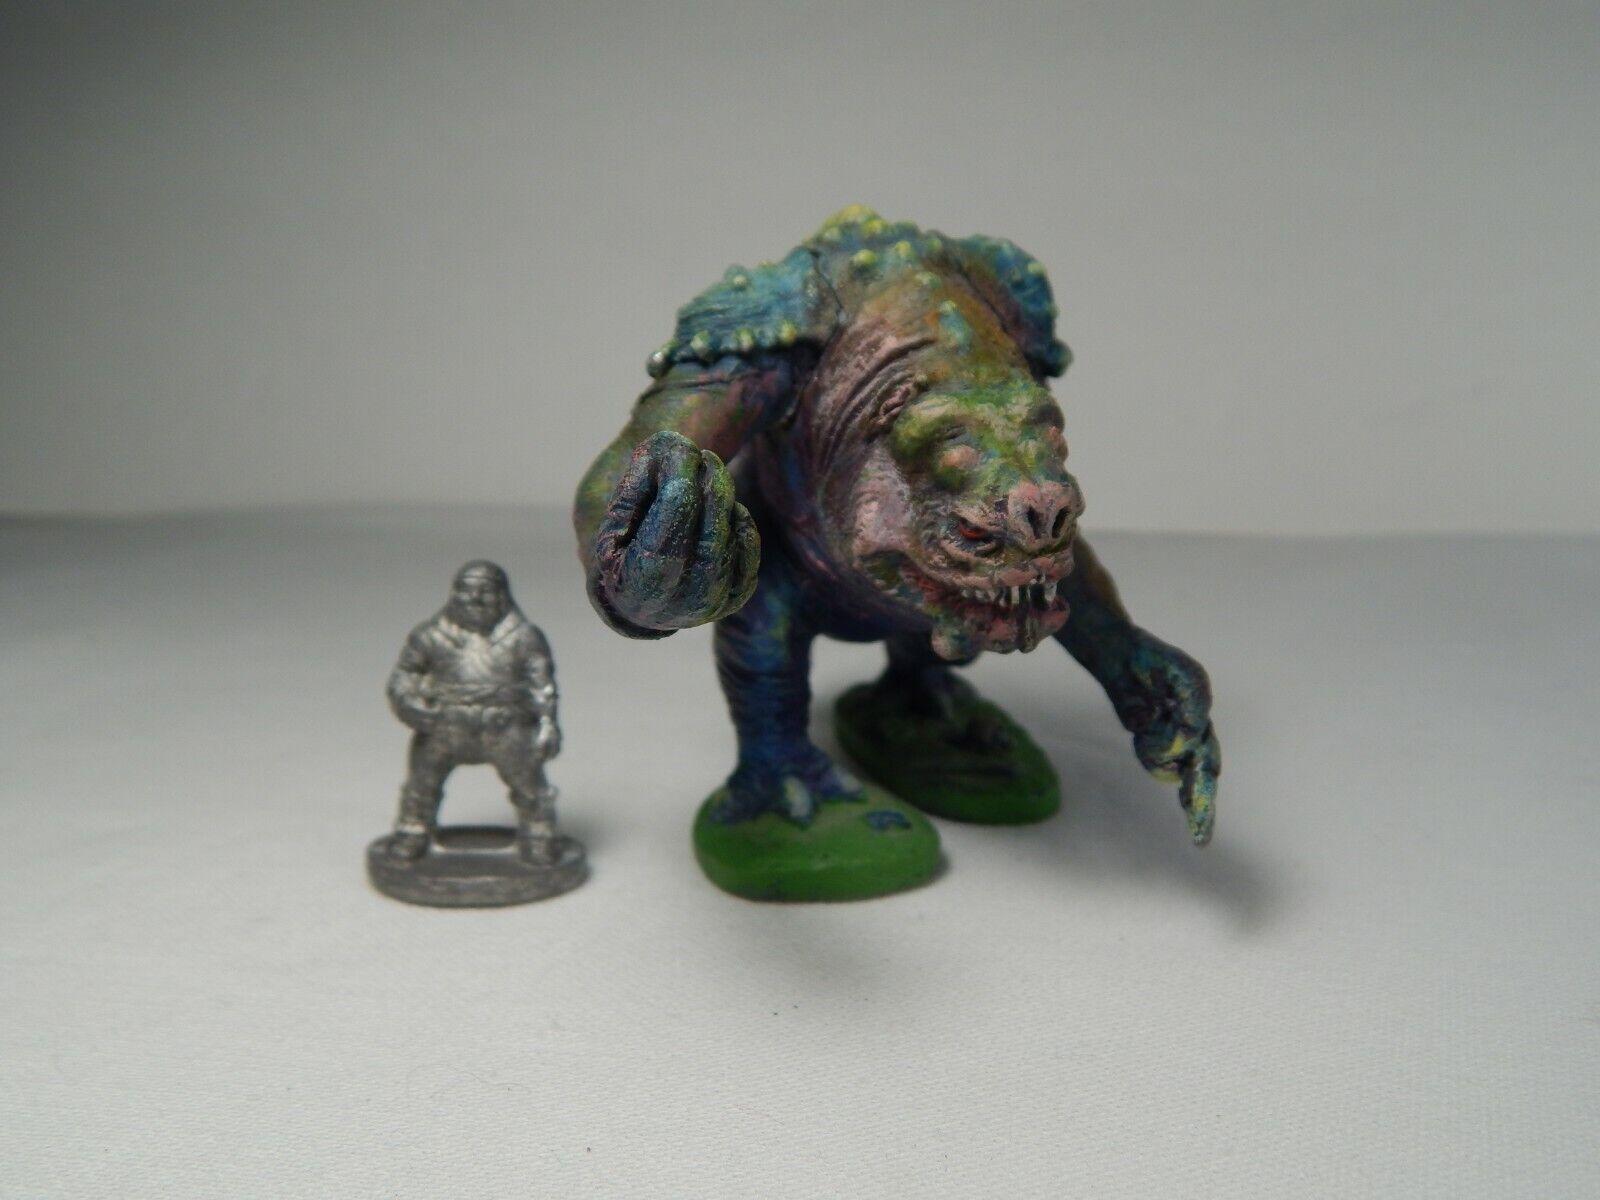 Grenadier estrella guerras 40311 The Rancor Pit.Hobby Products Metal Miniature.1990